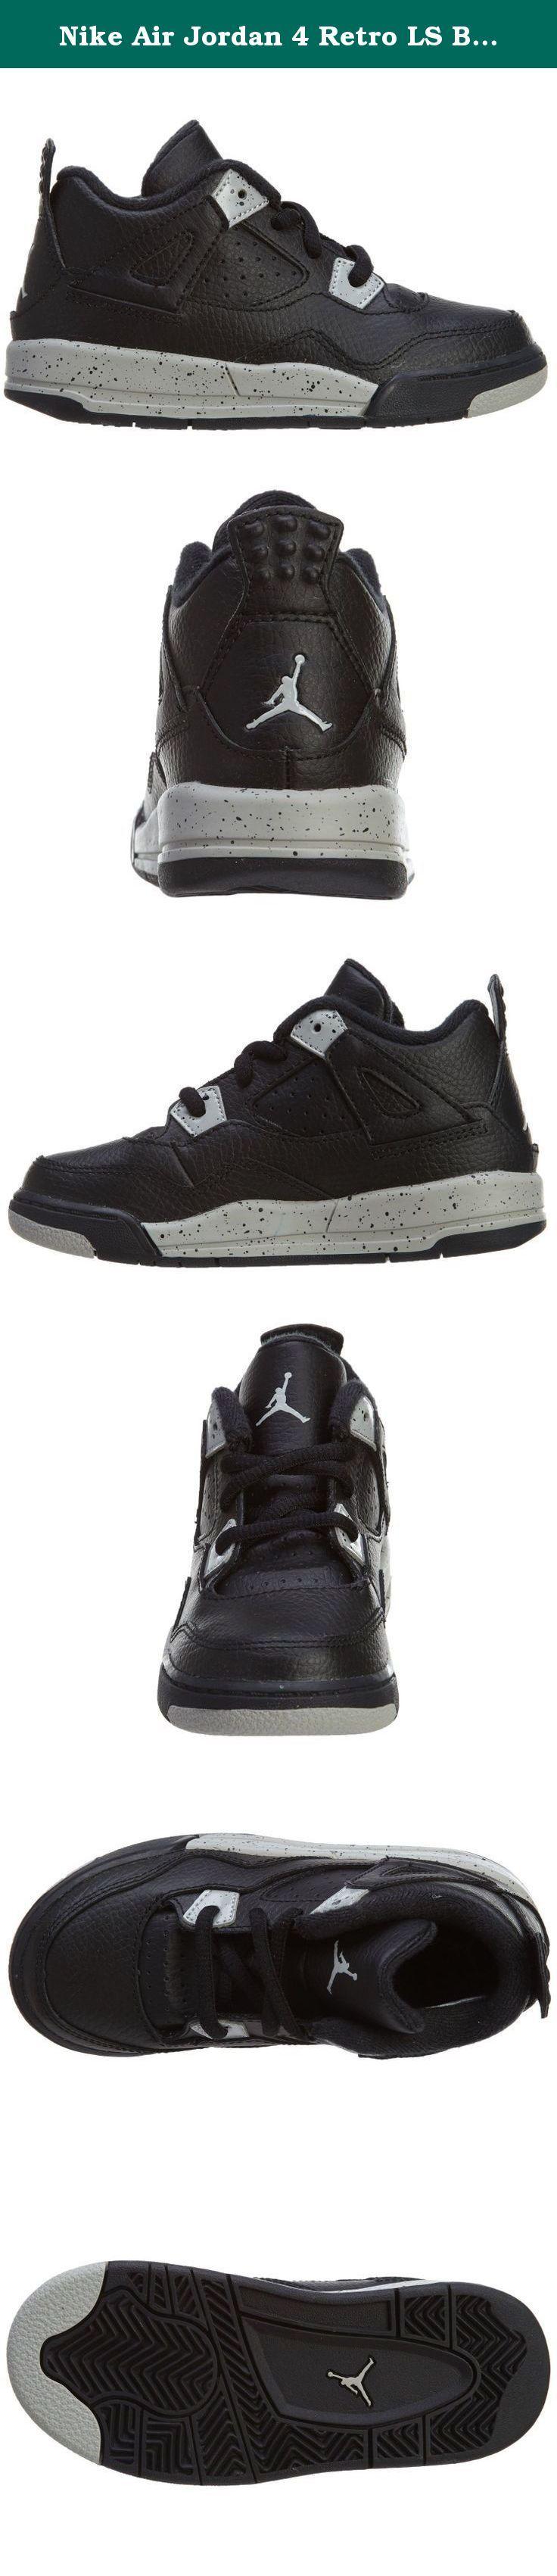 Nike Air Jordan 4 Retro LS BT Infant Toddler Trainers 707432 Sneakers Shoes (uk 3.5 us 4C eu 19.5, black tech grey black 003). nike air jordan 4 retro LS BT infant toddler trainers 707432 sneakers shoes.